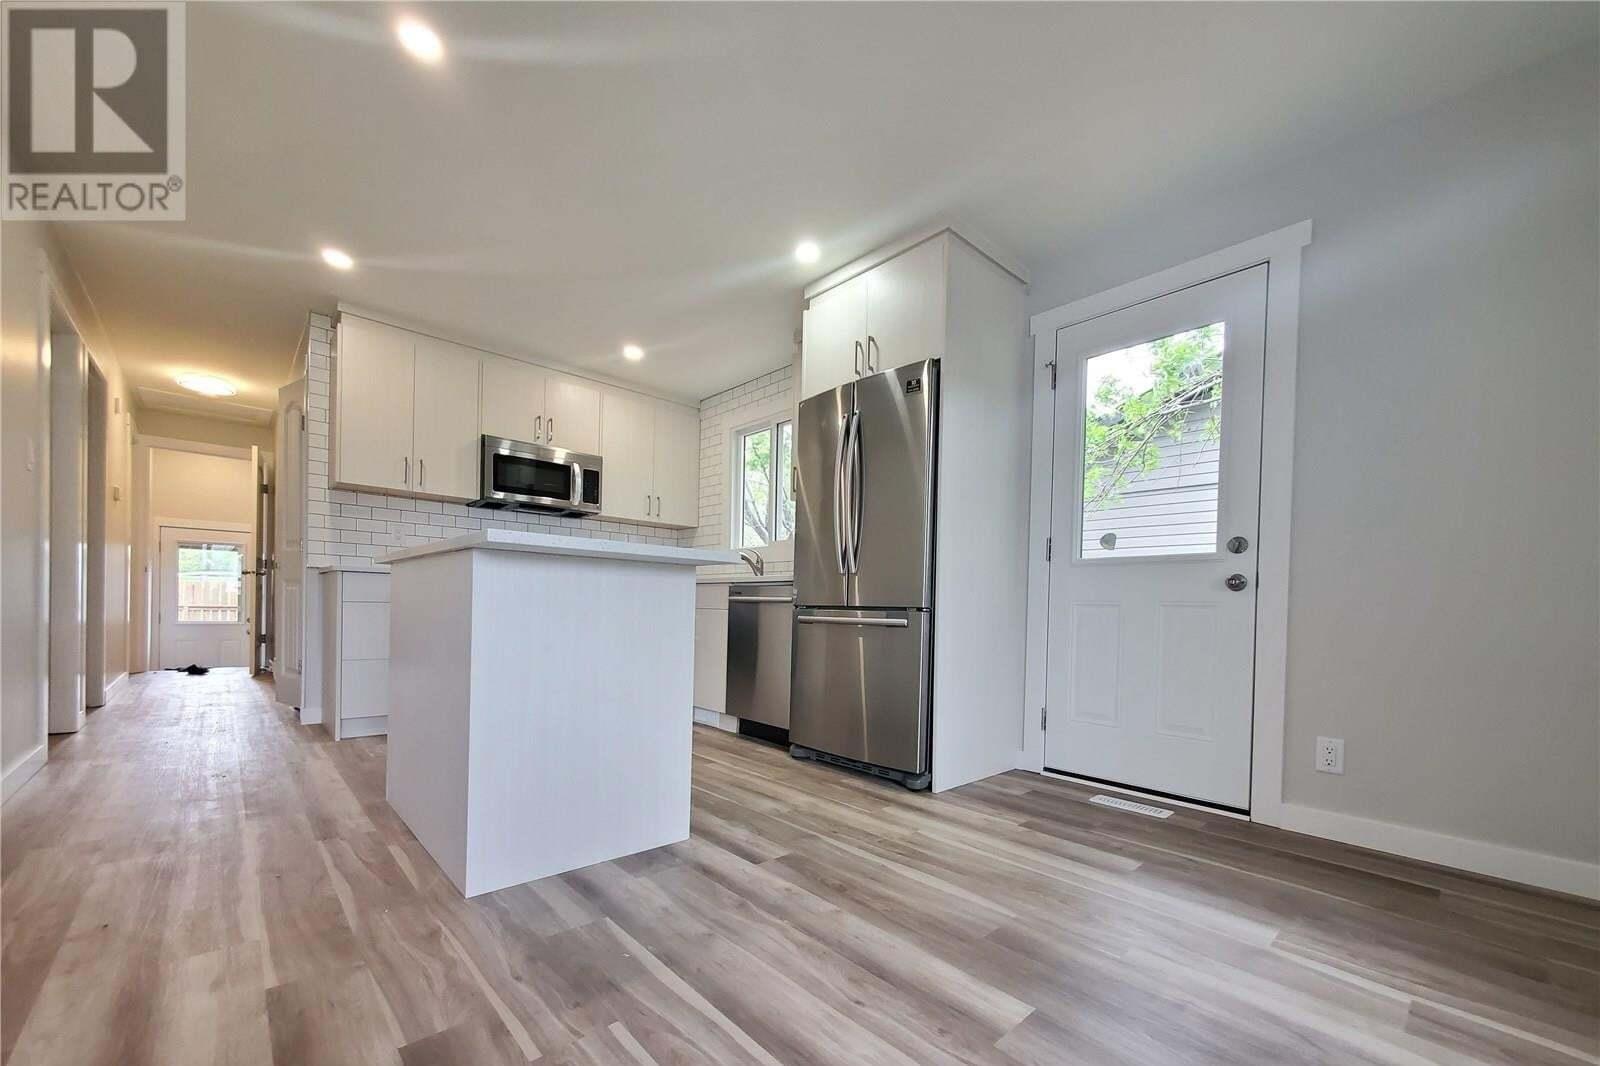 House for sale at 1518 Grosvenor St Regina Saskatchewan - MLS: SK809747